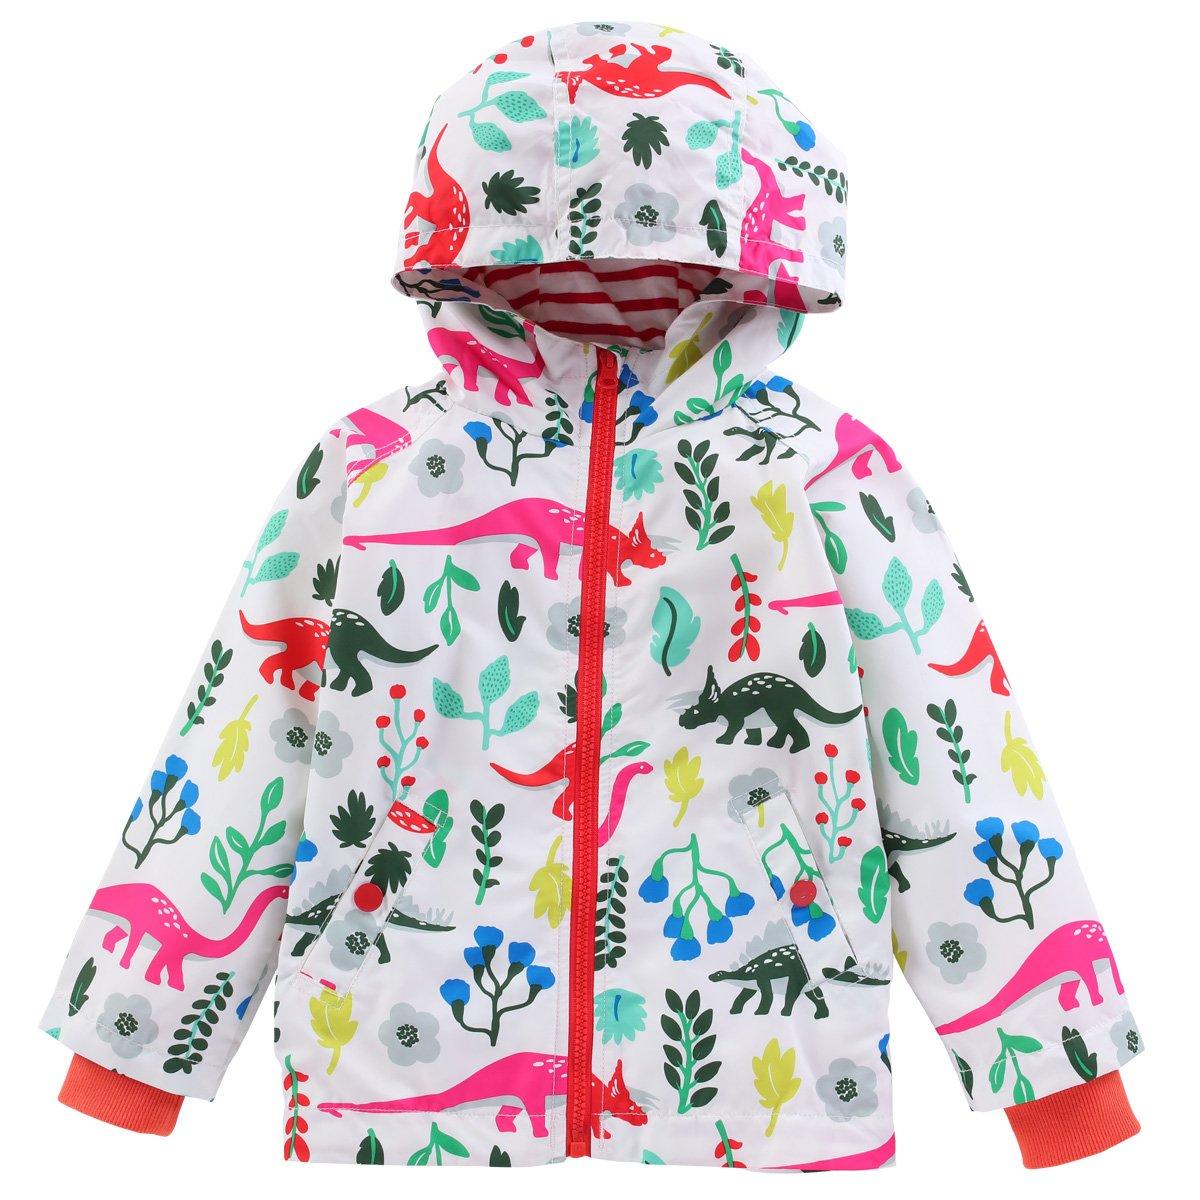 LZH Toddler Boys Waterproof Raincoat Dinosaur Hooded Jacket Coat C008